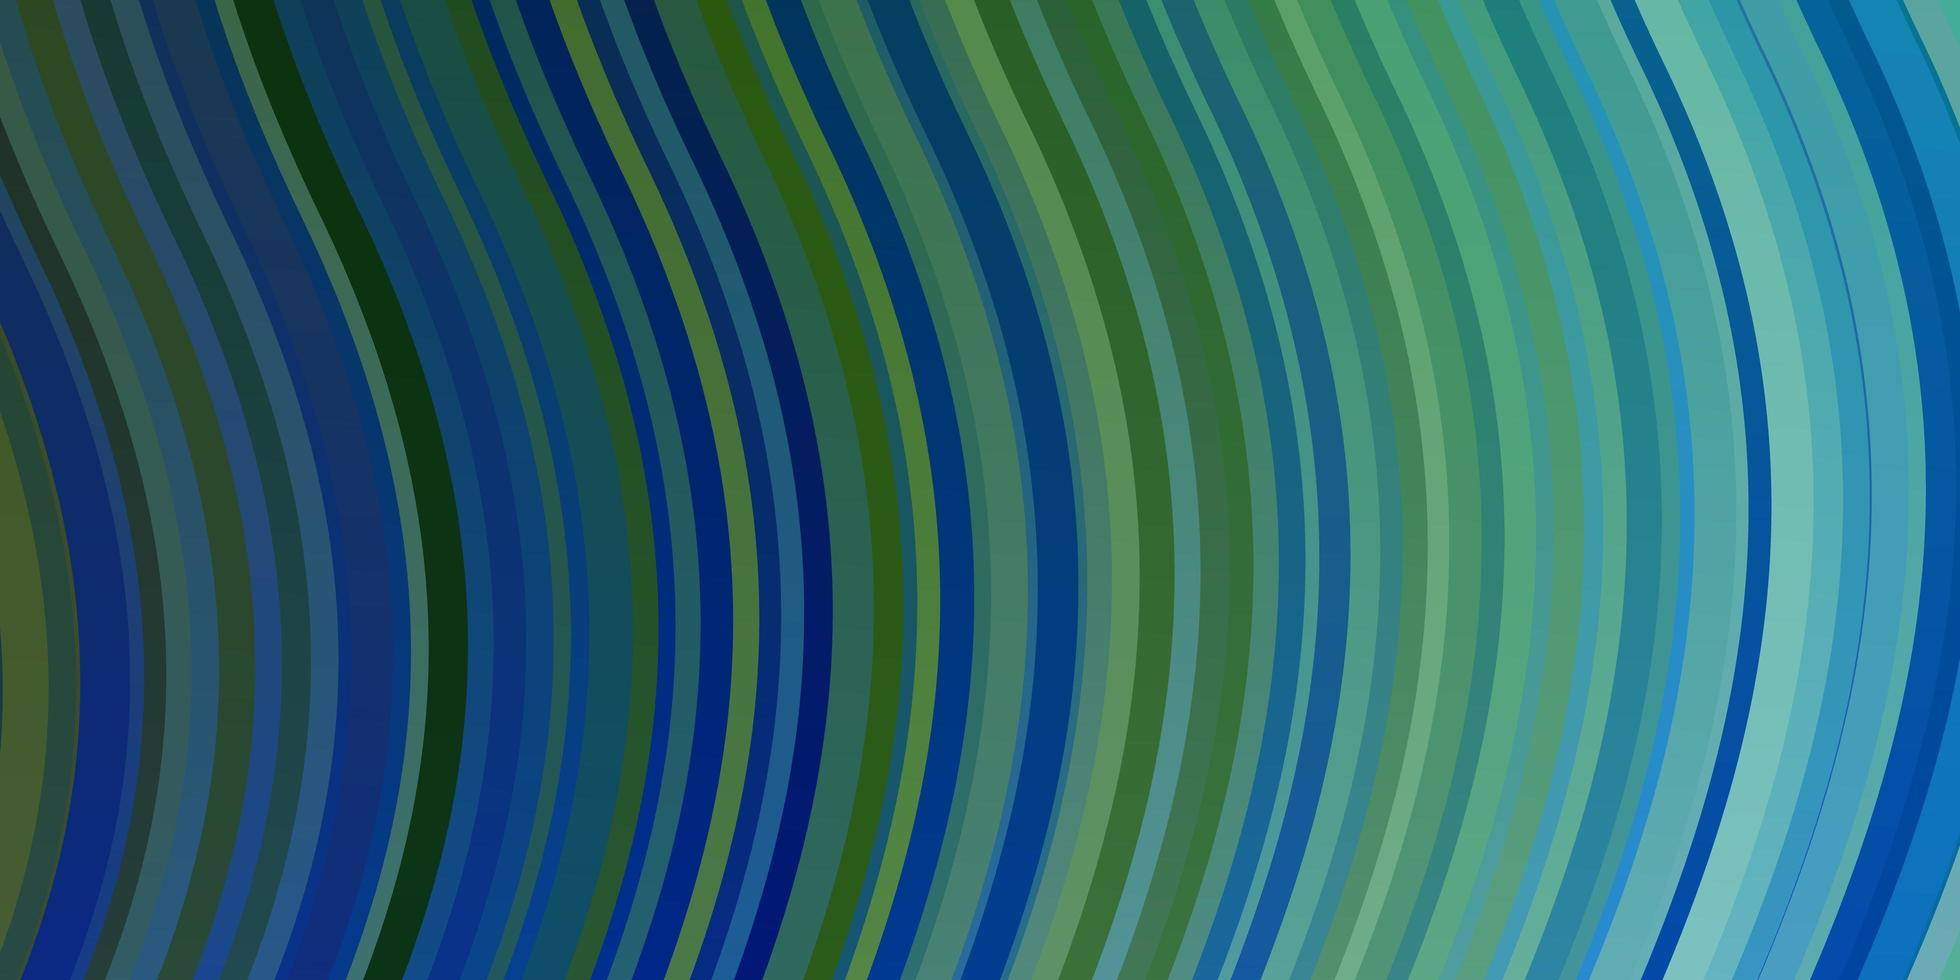 hellblaue, grüne Vektorschablone mit Kurven. vektor